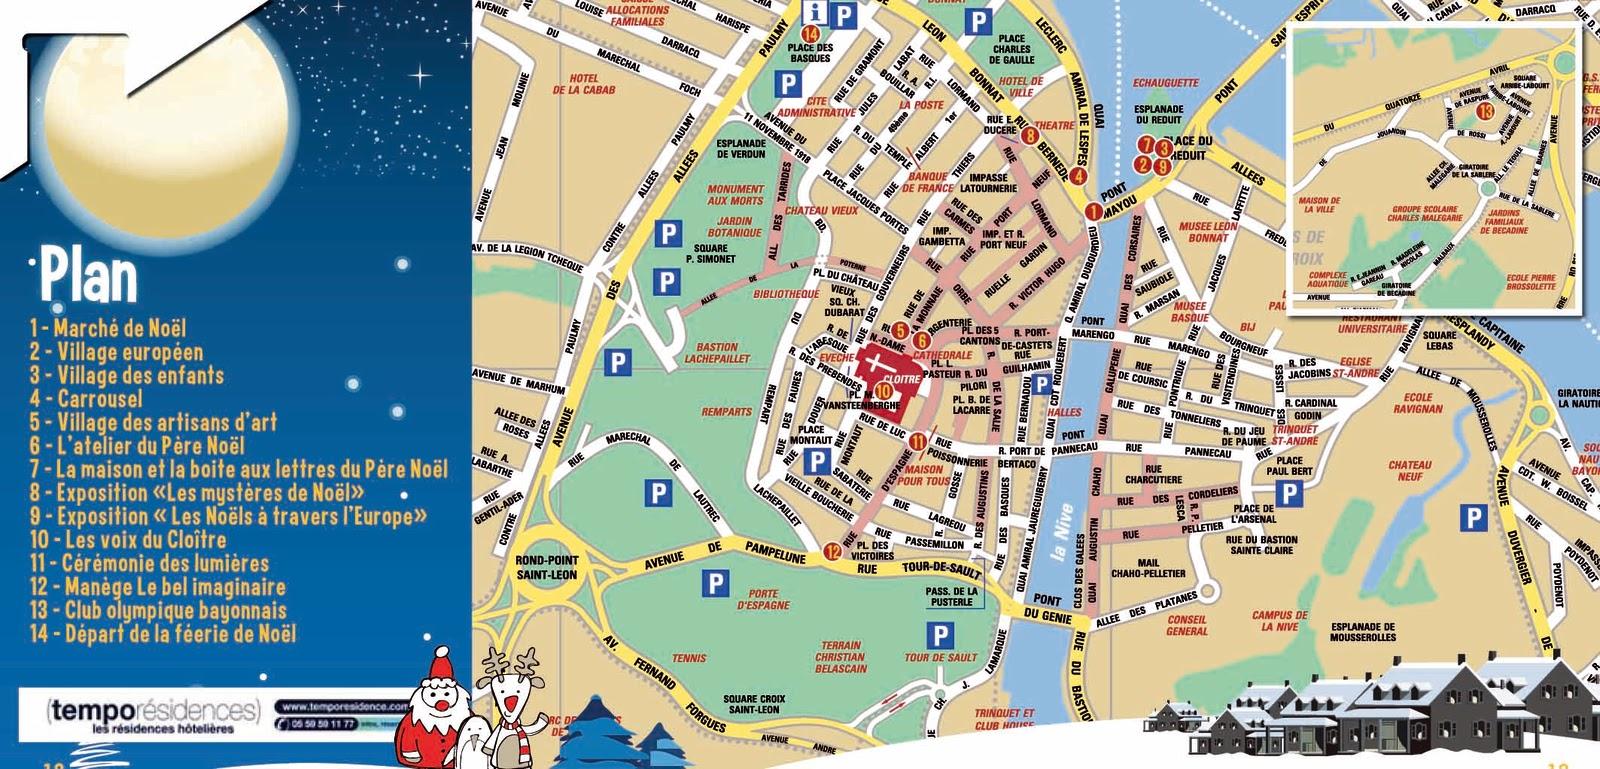 plan de bayonne plan de bayonne voyages cartes info plan de la ville de bayonne les sorties. Black Bedroom Furniture Sets. Home Design Ideas